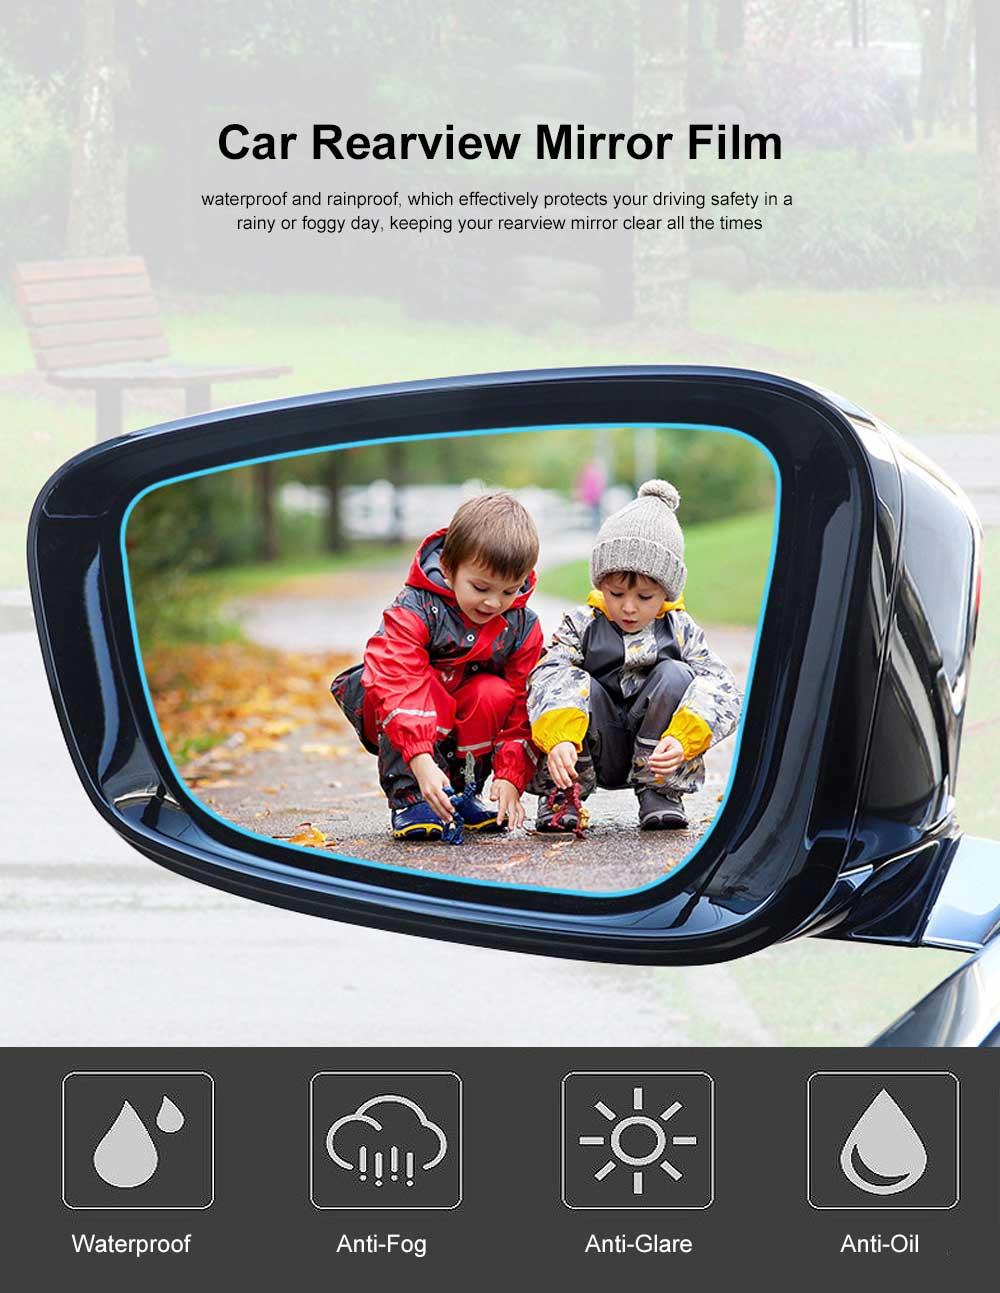 Car Rearview Mirror Protective Film Waterproof Film Anti-Fog HD Anti-Glare Clear Protective Film for Audi A3 A4L A5 A6L Q3 Q5 Q7 0